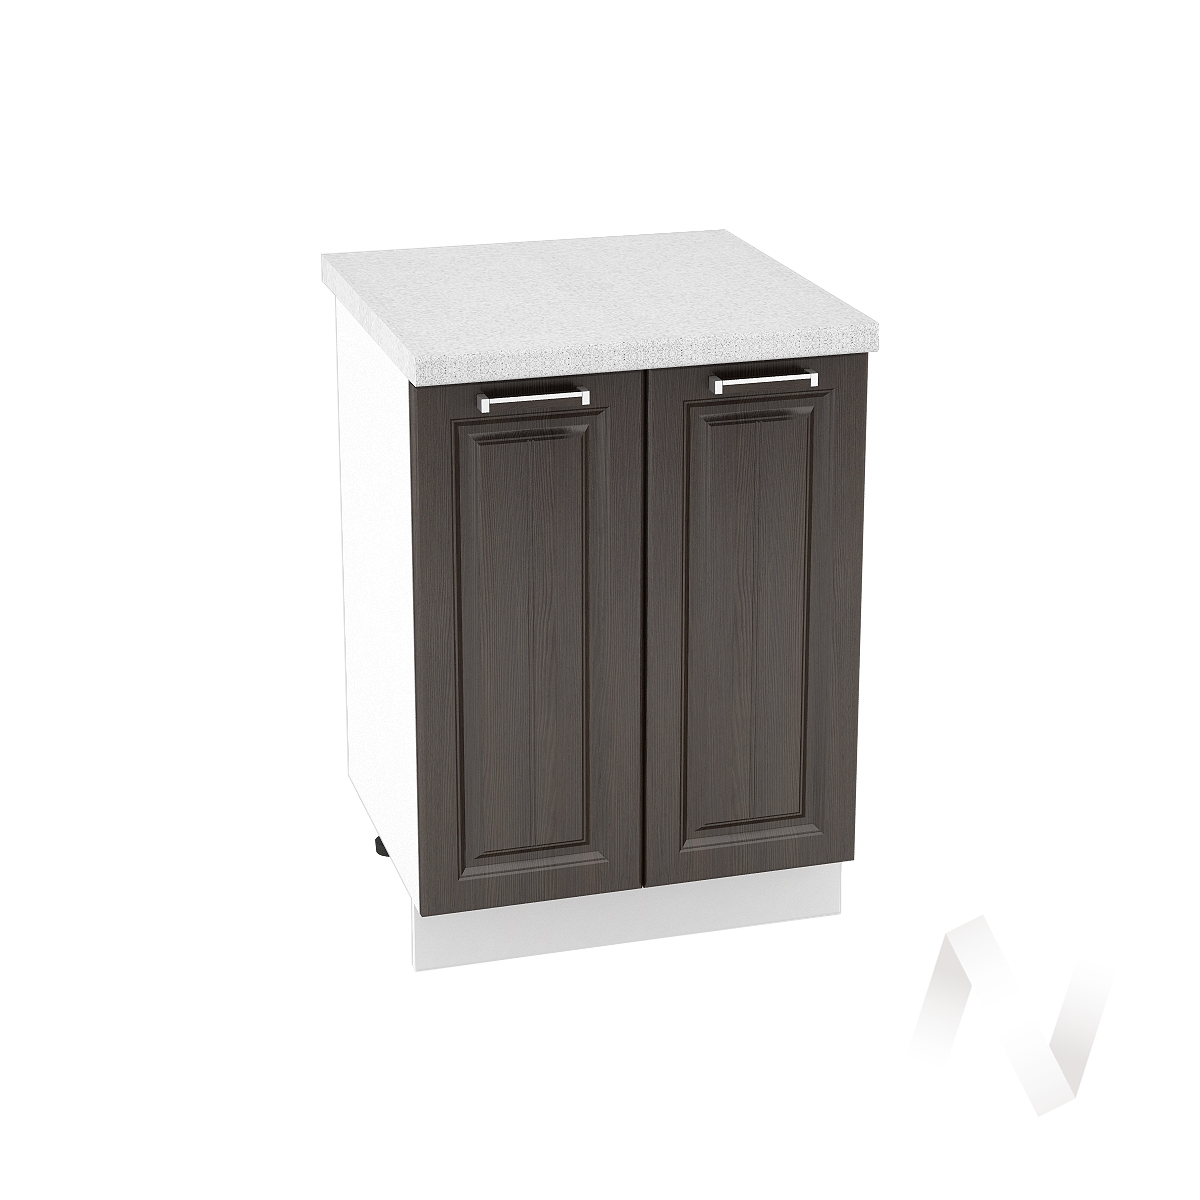 "Кухня ""Прага"": Шкаф нижний 600, ШН 600 (венге/корпус белый)"